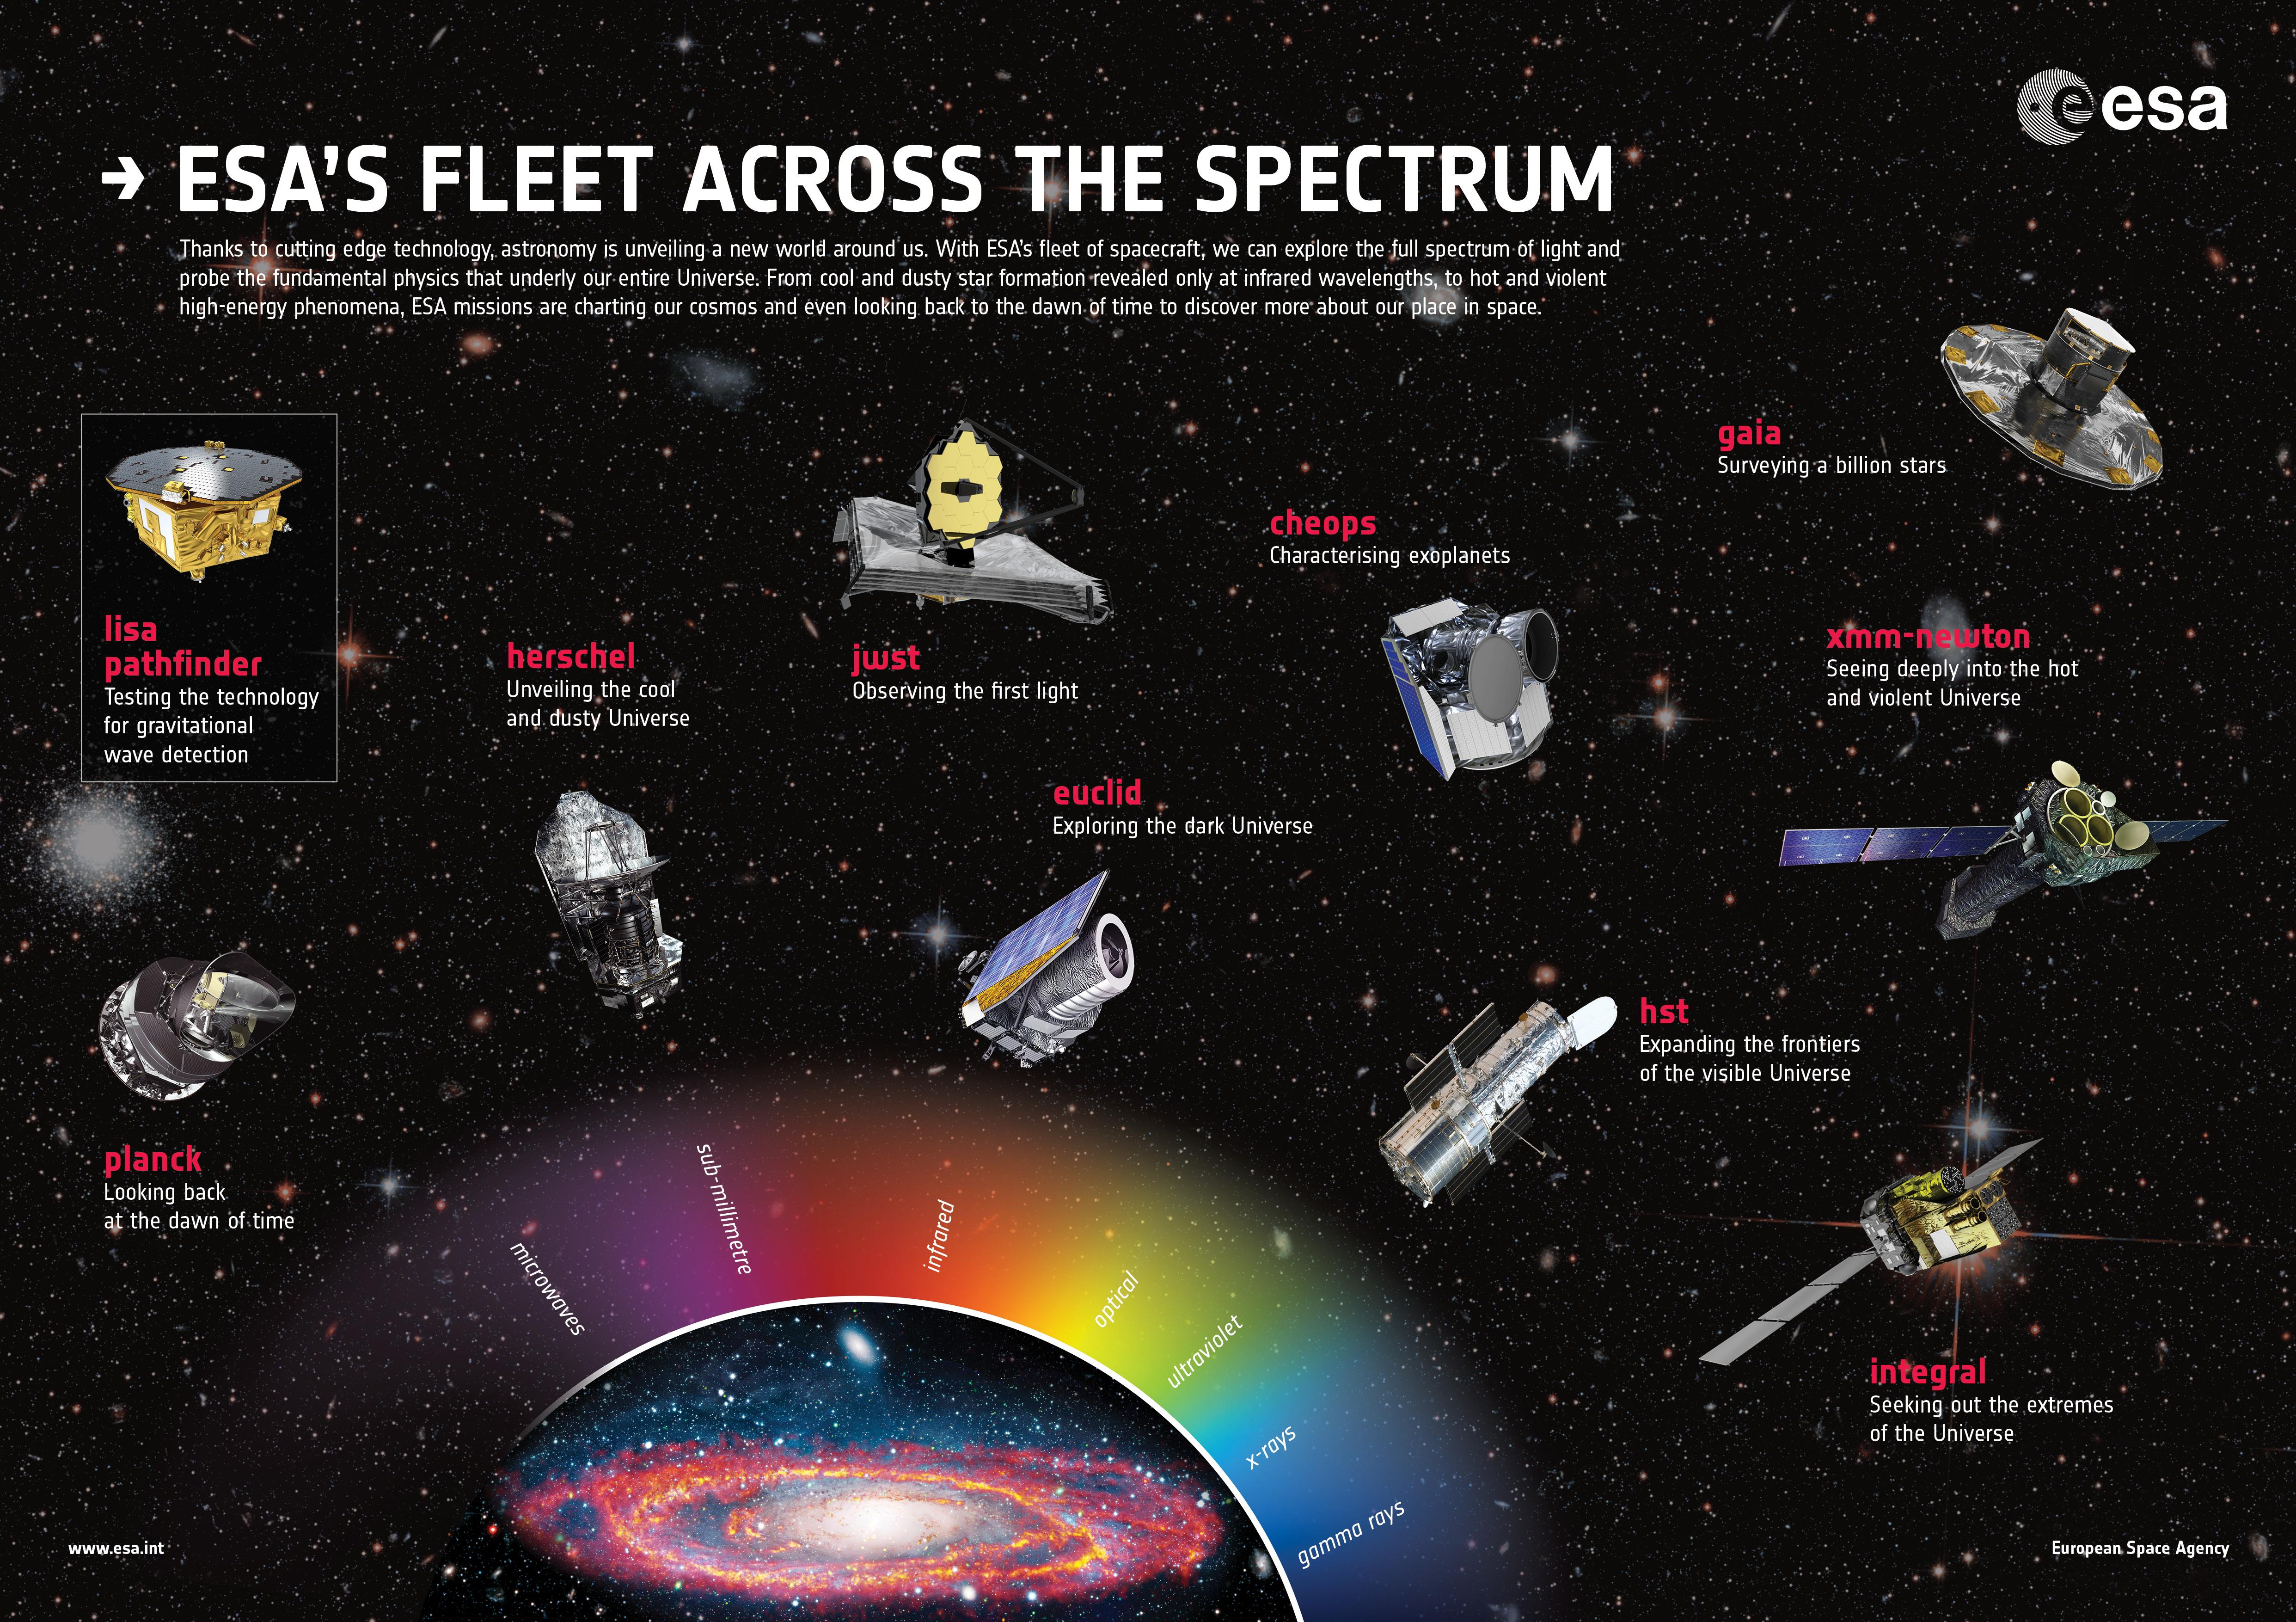 1567214829839-ESA_fleet_across_the_spectrum_poster_2017.jpg